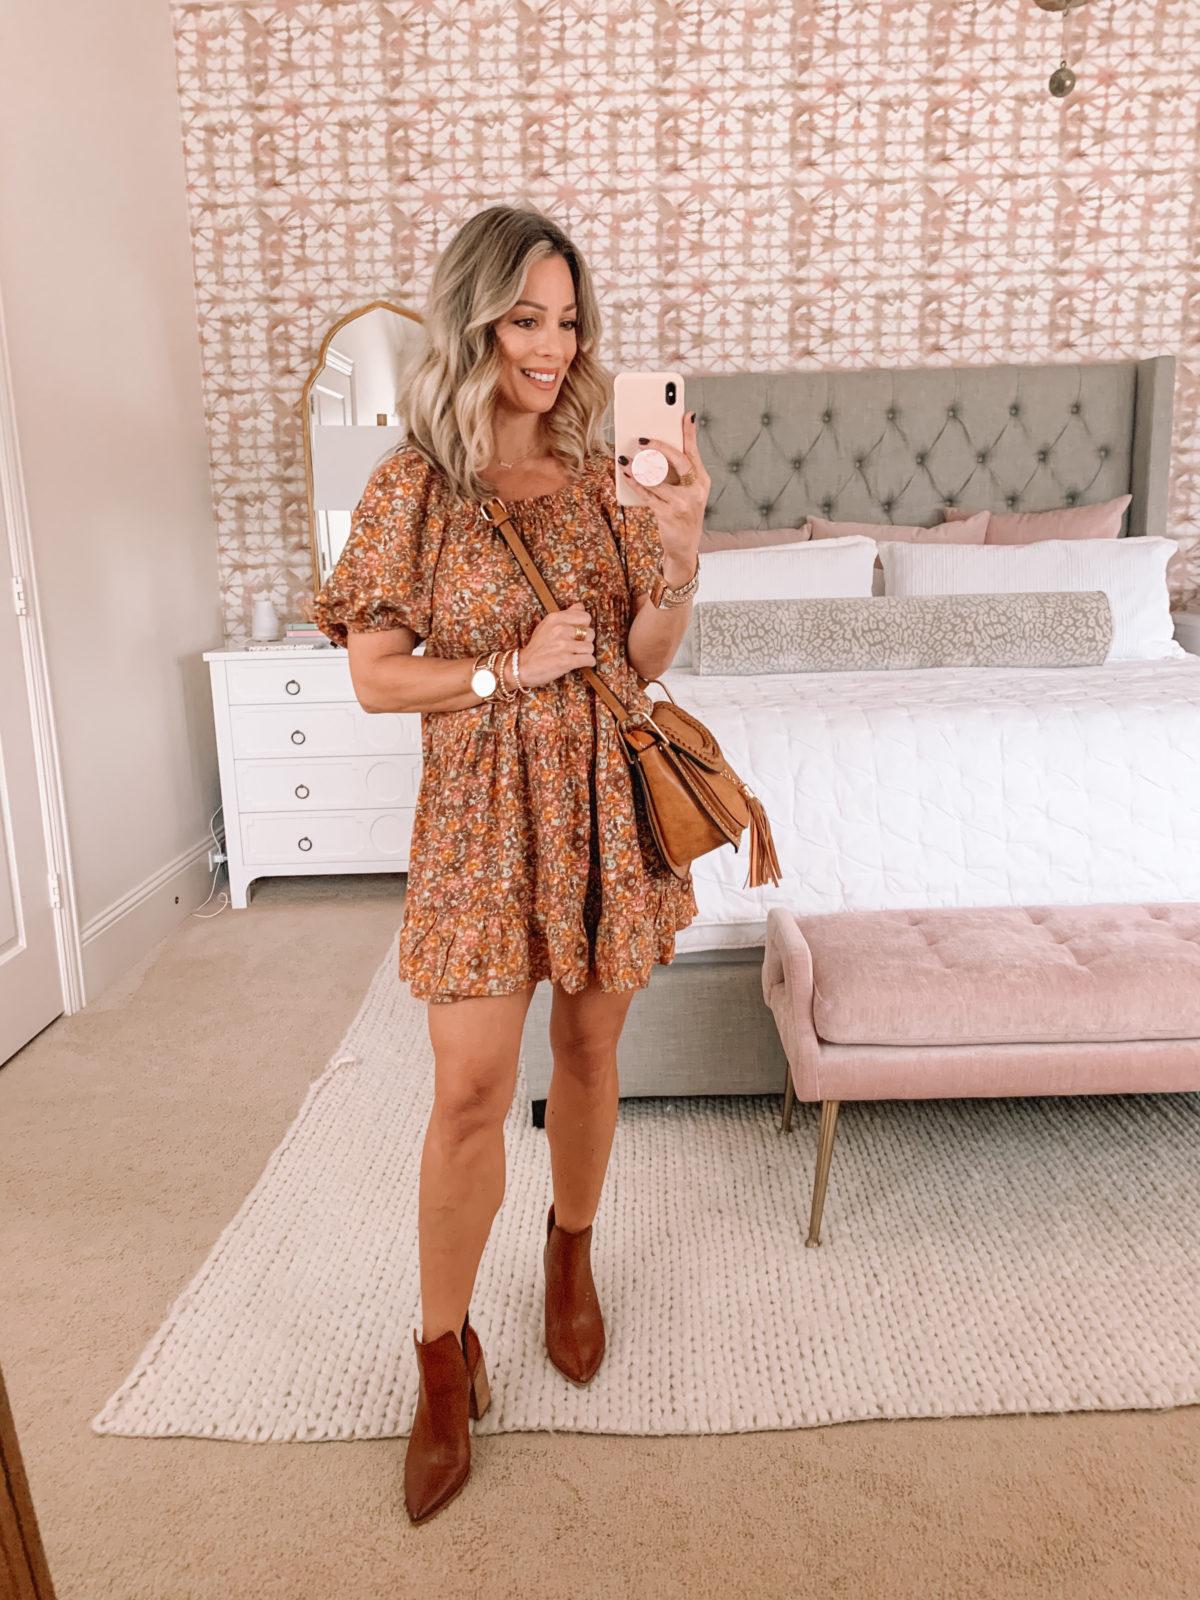 Dressing Room Finds, Target, Floral Dress, Booties, Crossbody